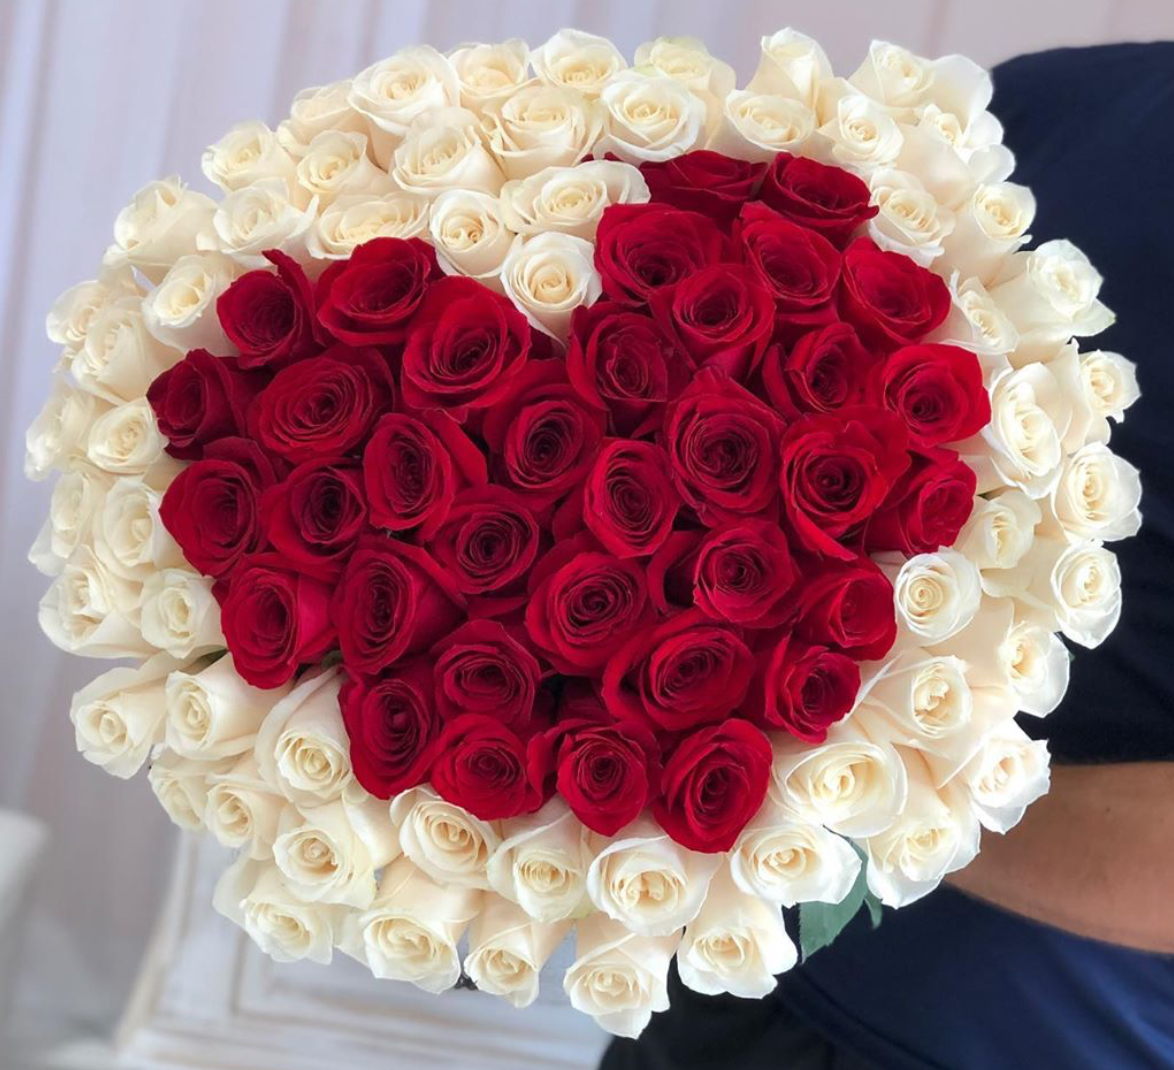 Фото букета роз в виде сердца